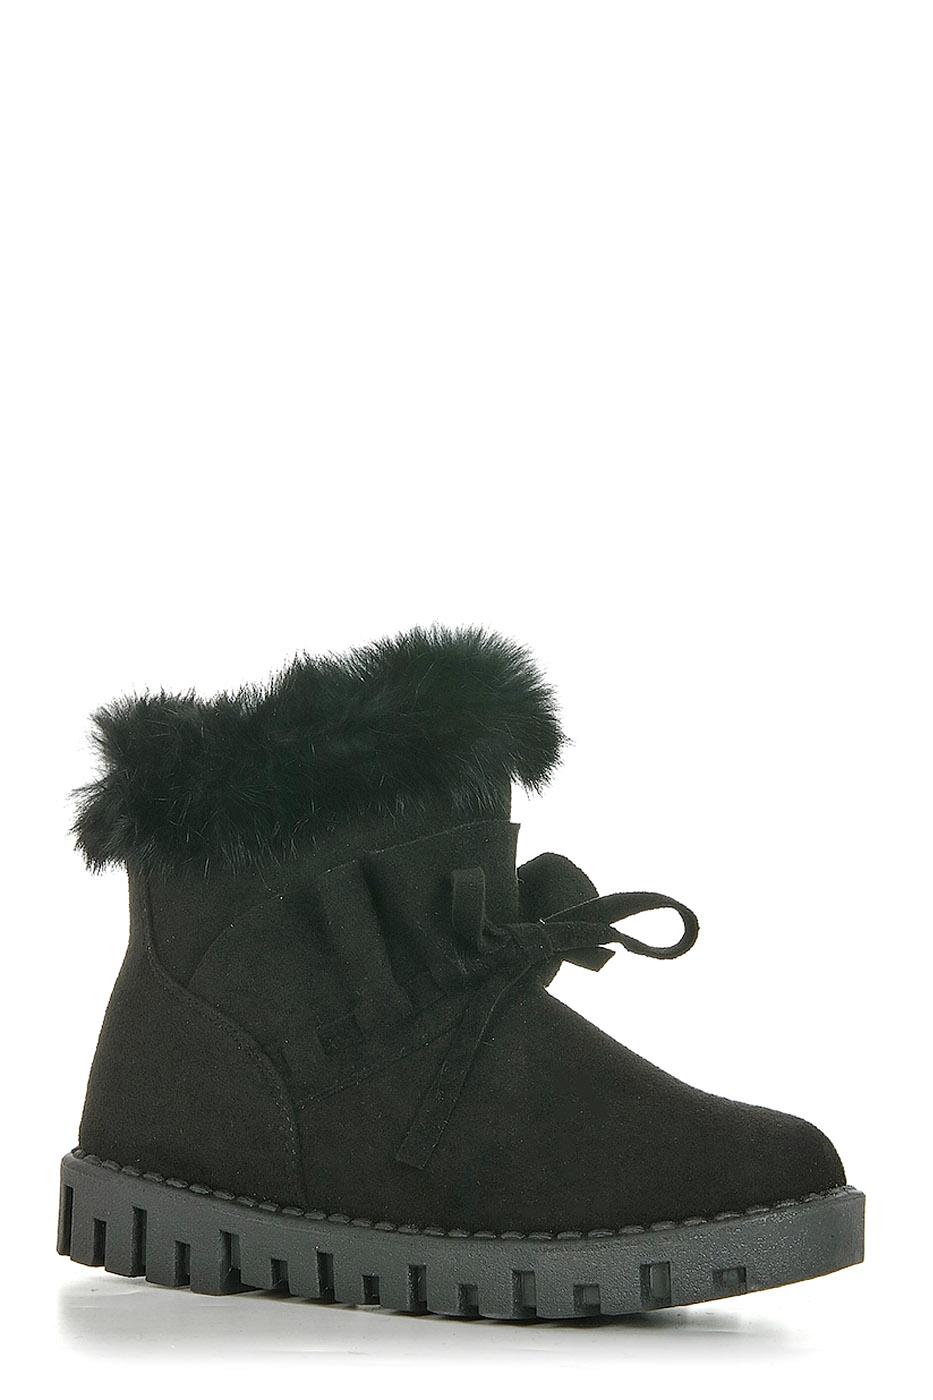 Ботинки TOPLAND2352-PB76211B/BLACK